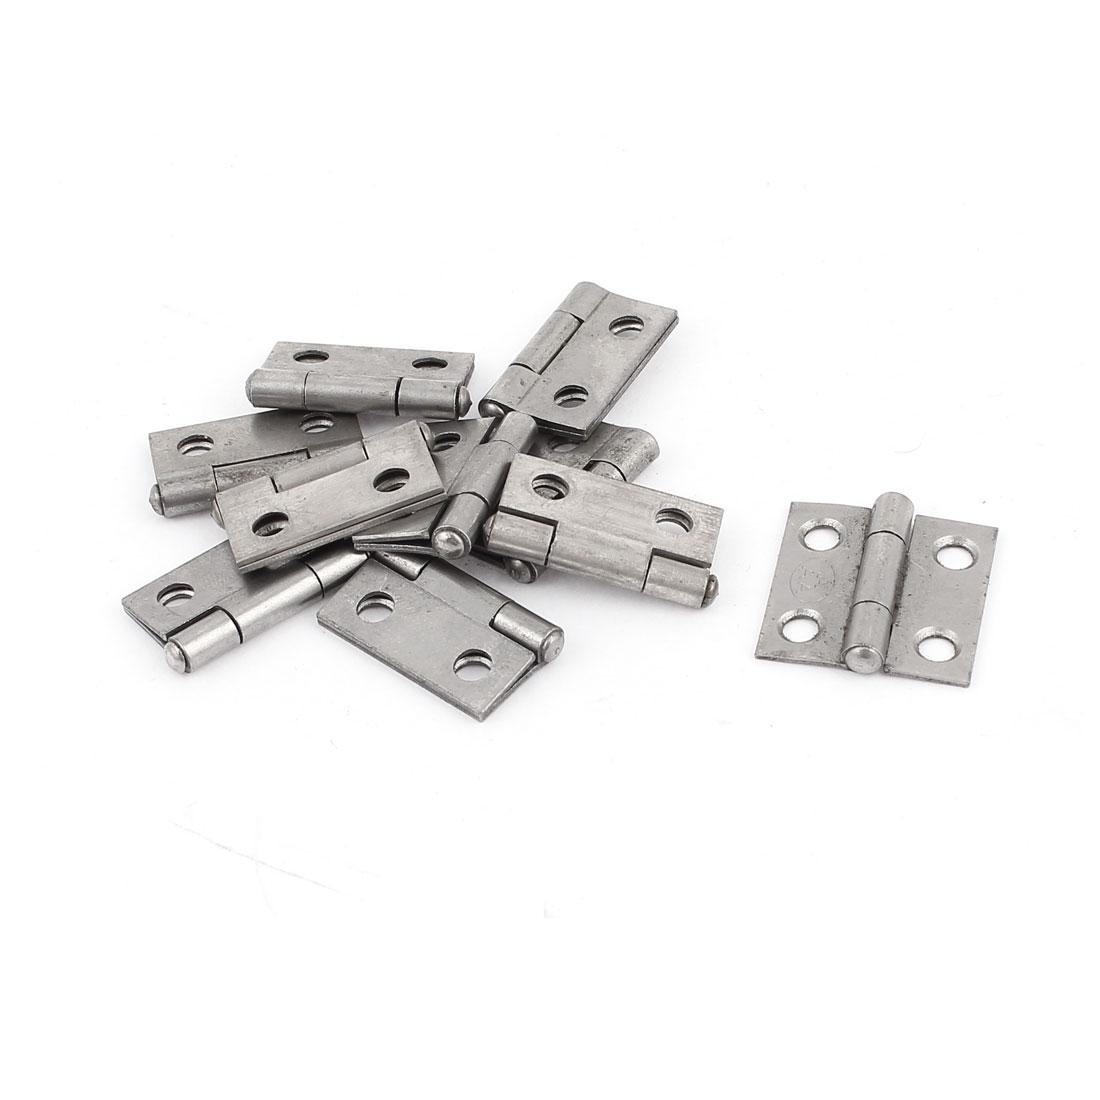 "1"" Metal Cabinet Drawer Door Butt Hinge Miniature Fittings 10pcs"